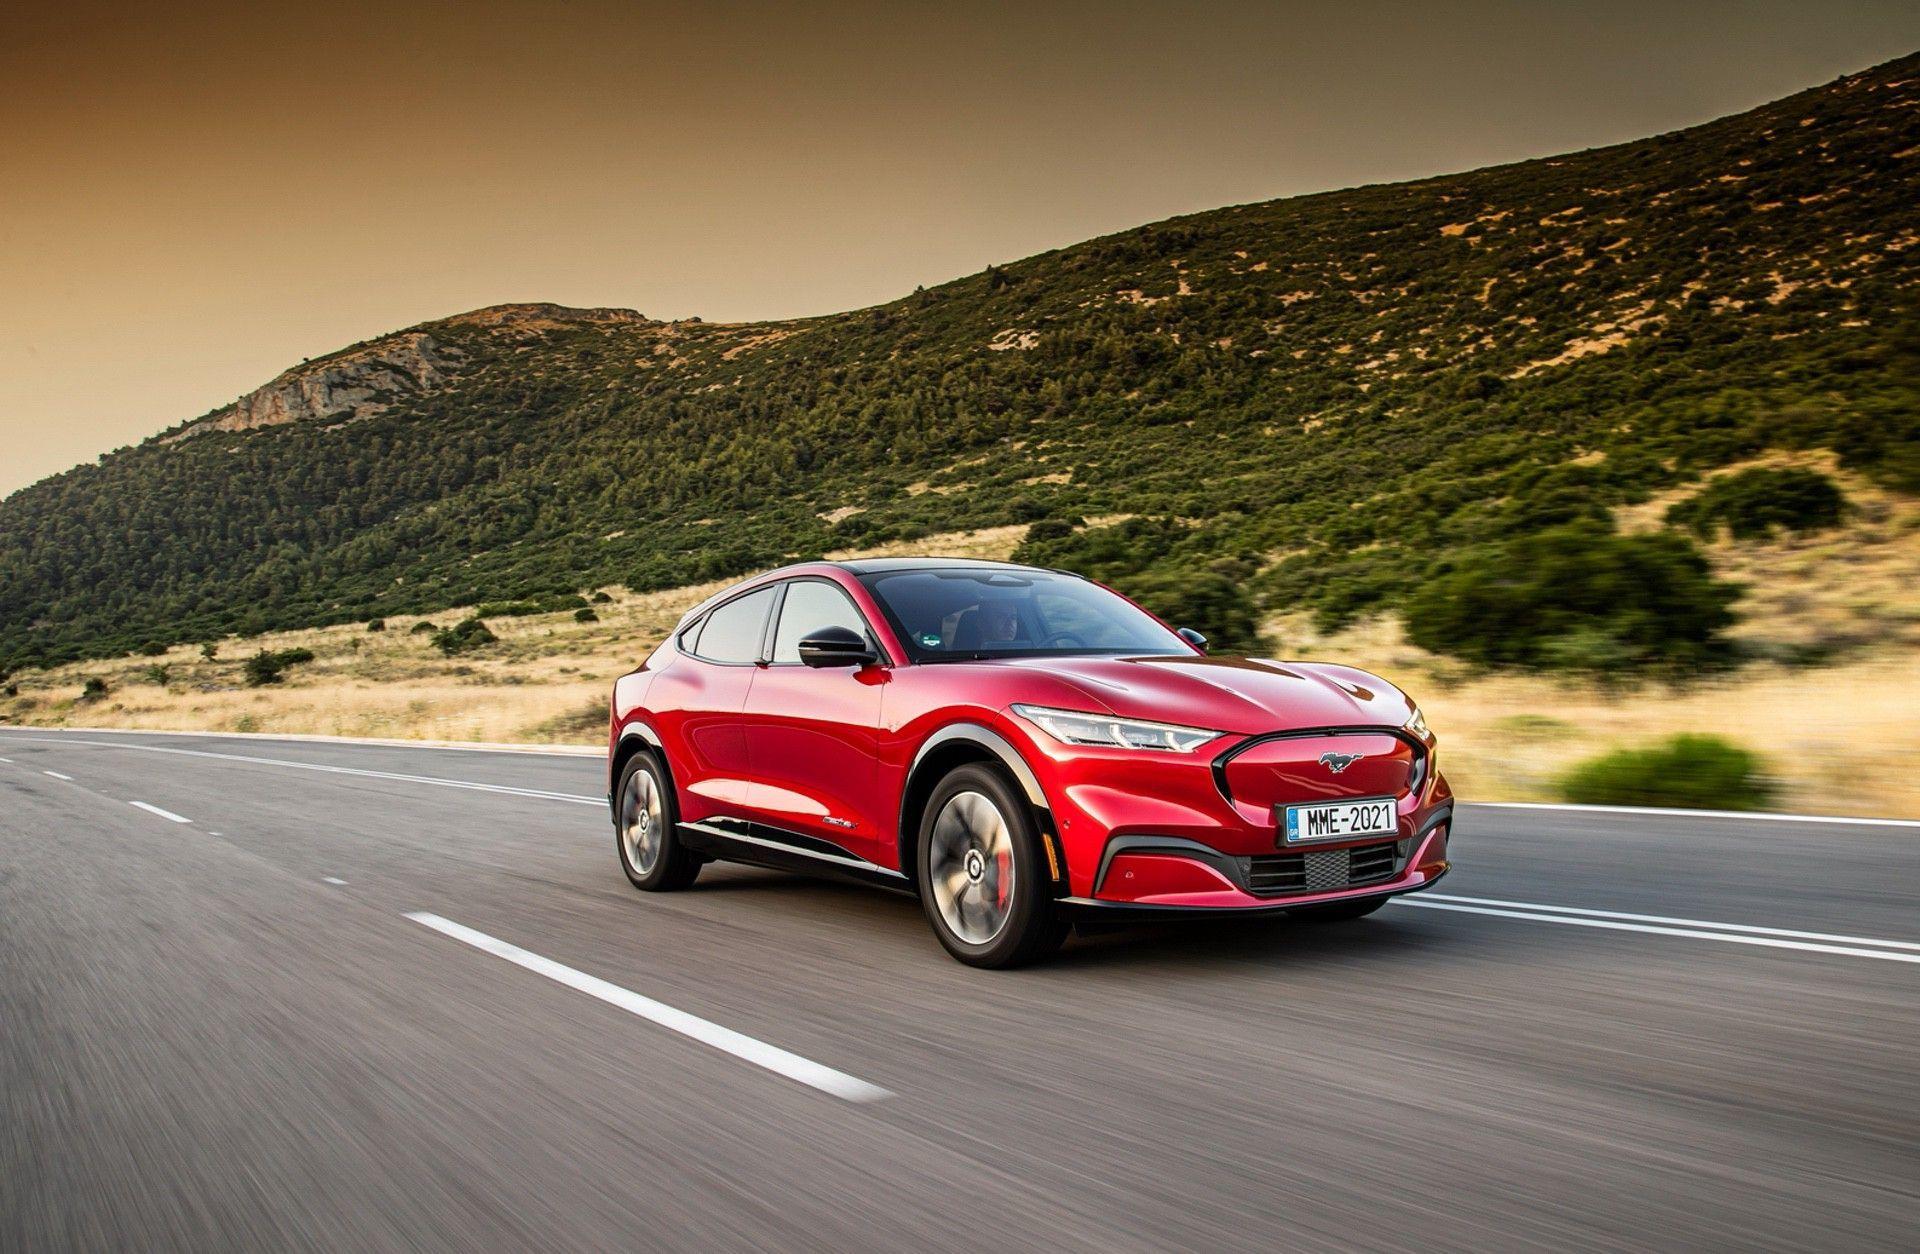 Ford_Mustang_Mach-E_greek_presskit-0111